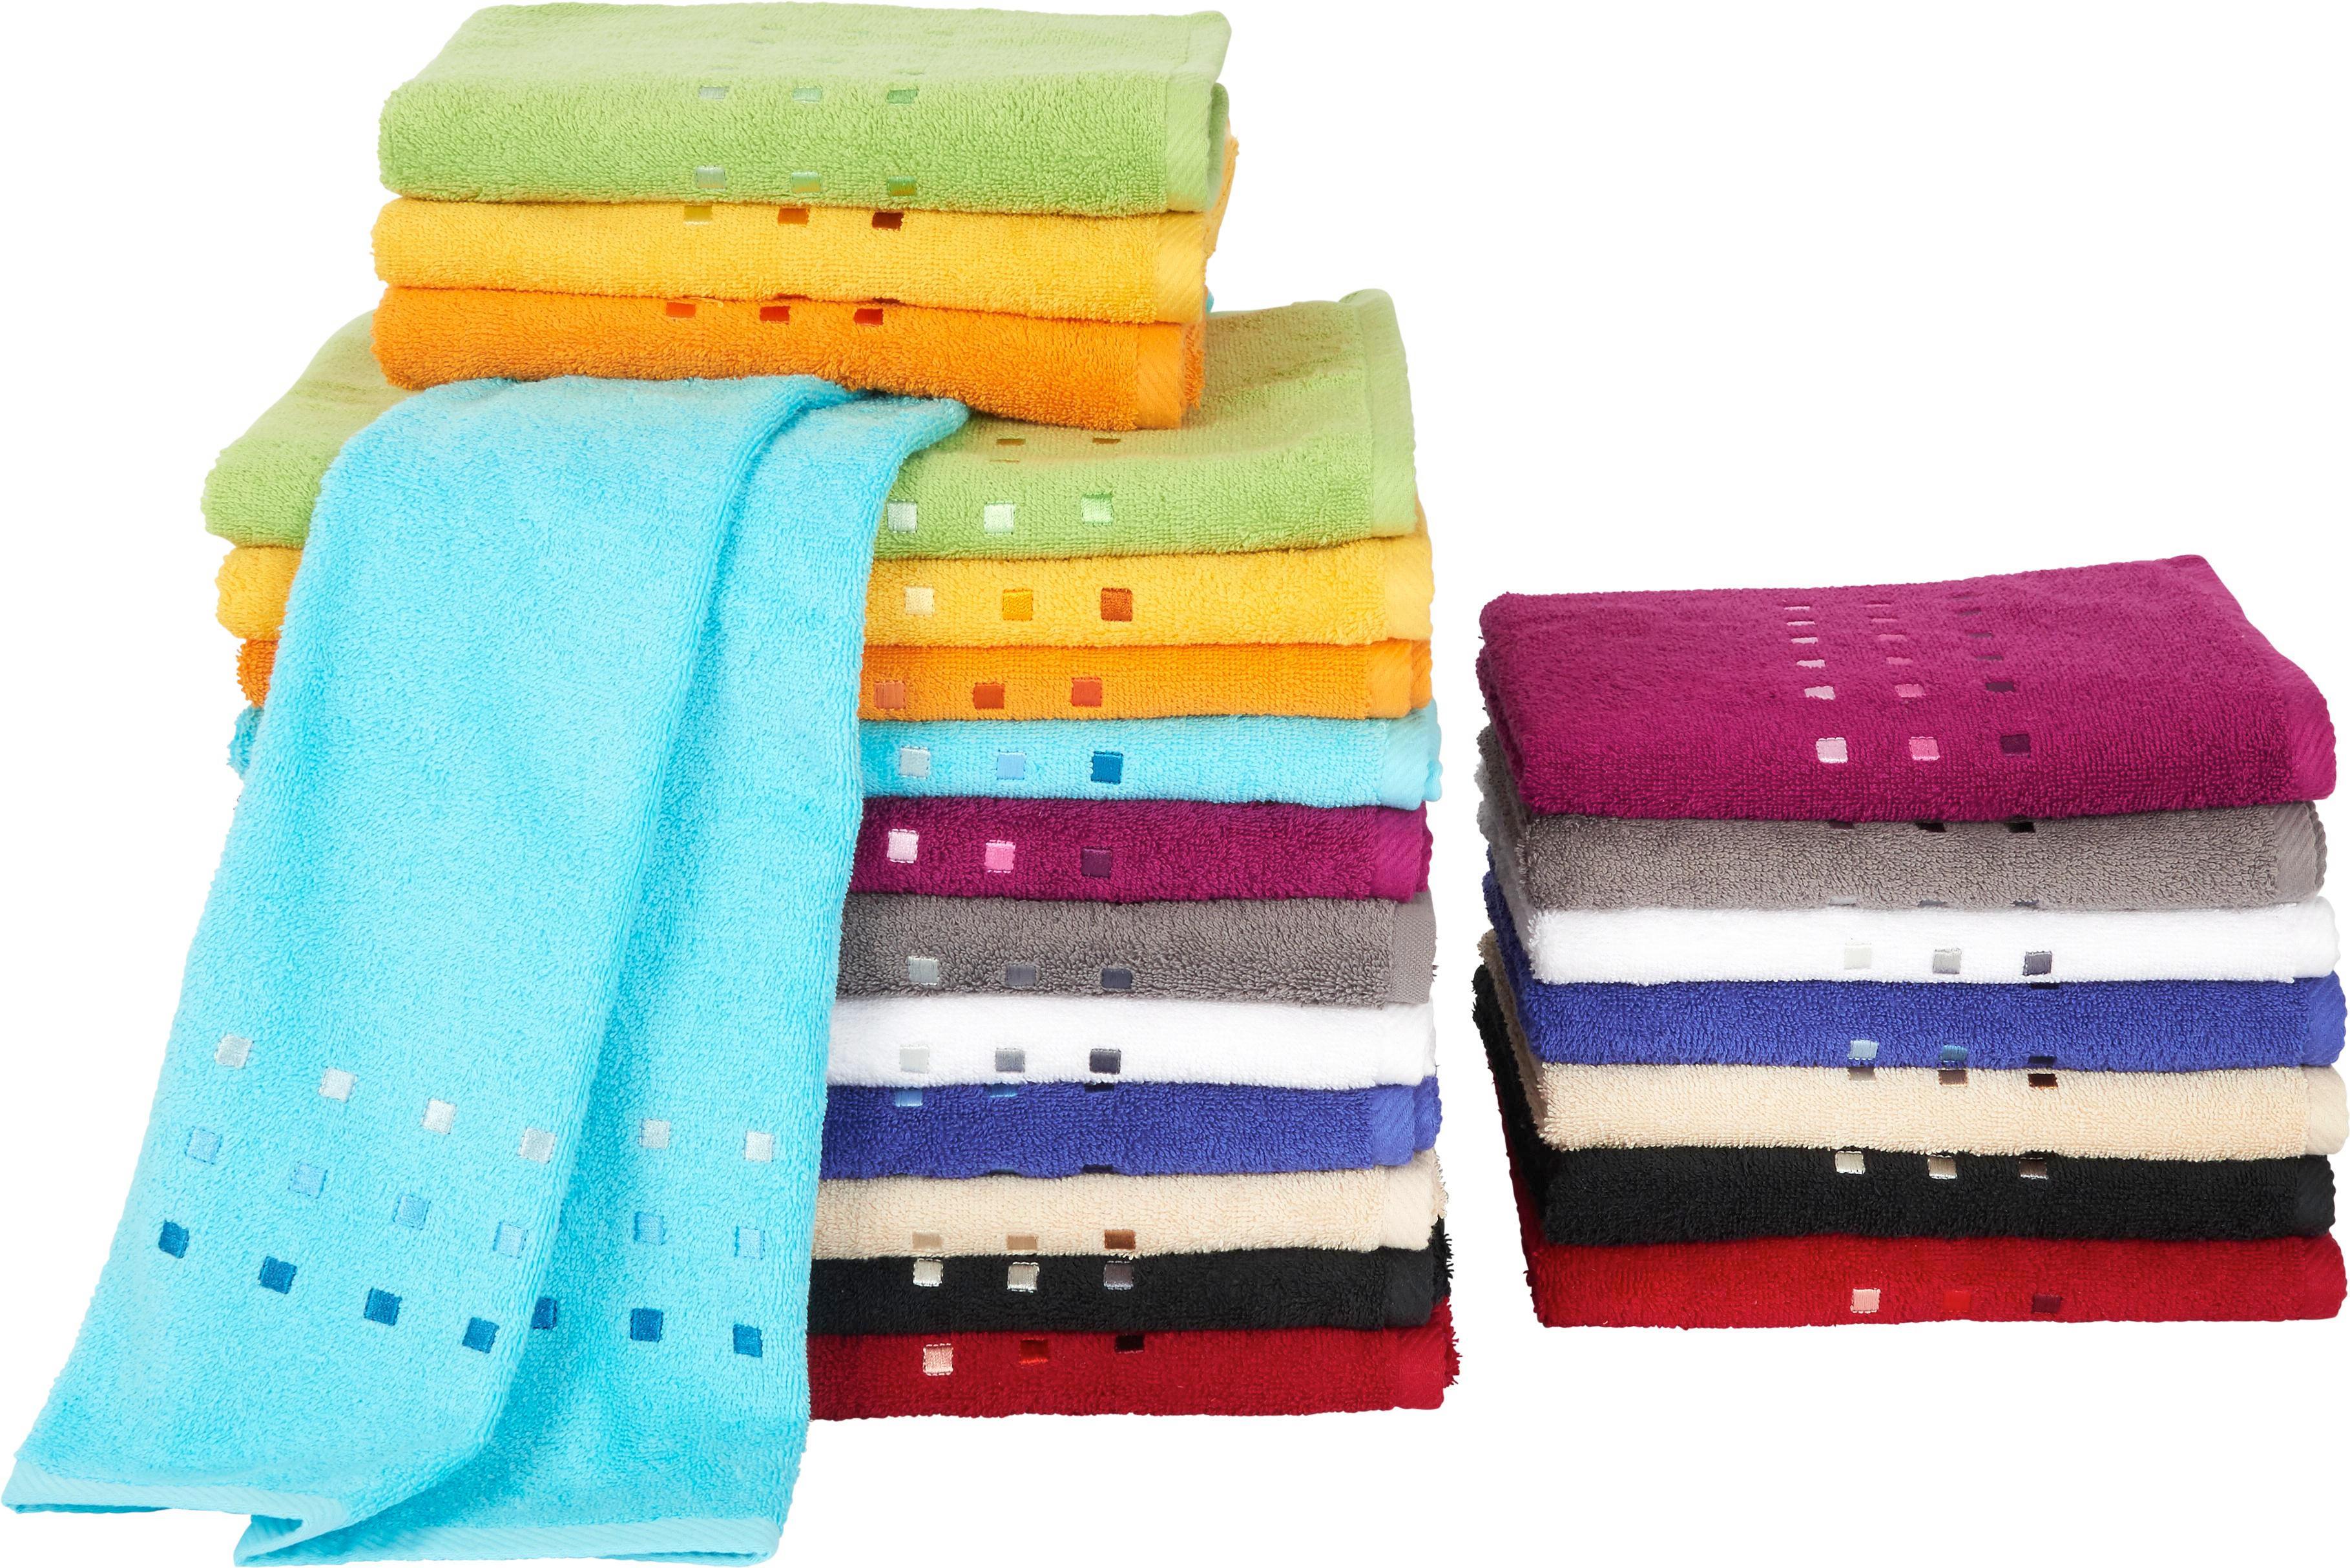 DUSCHTUCH 70/140 cm - Schwarz, Basics, Textil (70/140cm) - ESPOSA